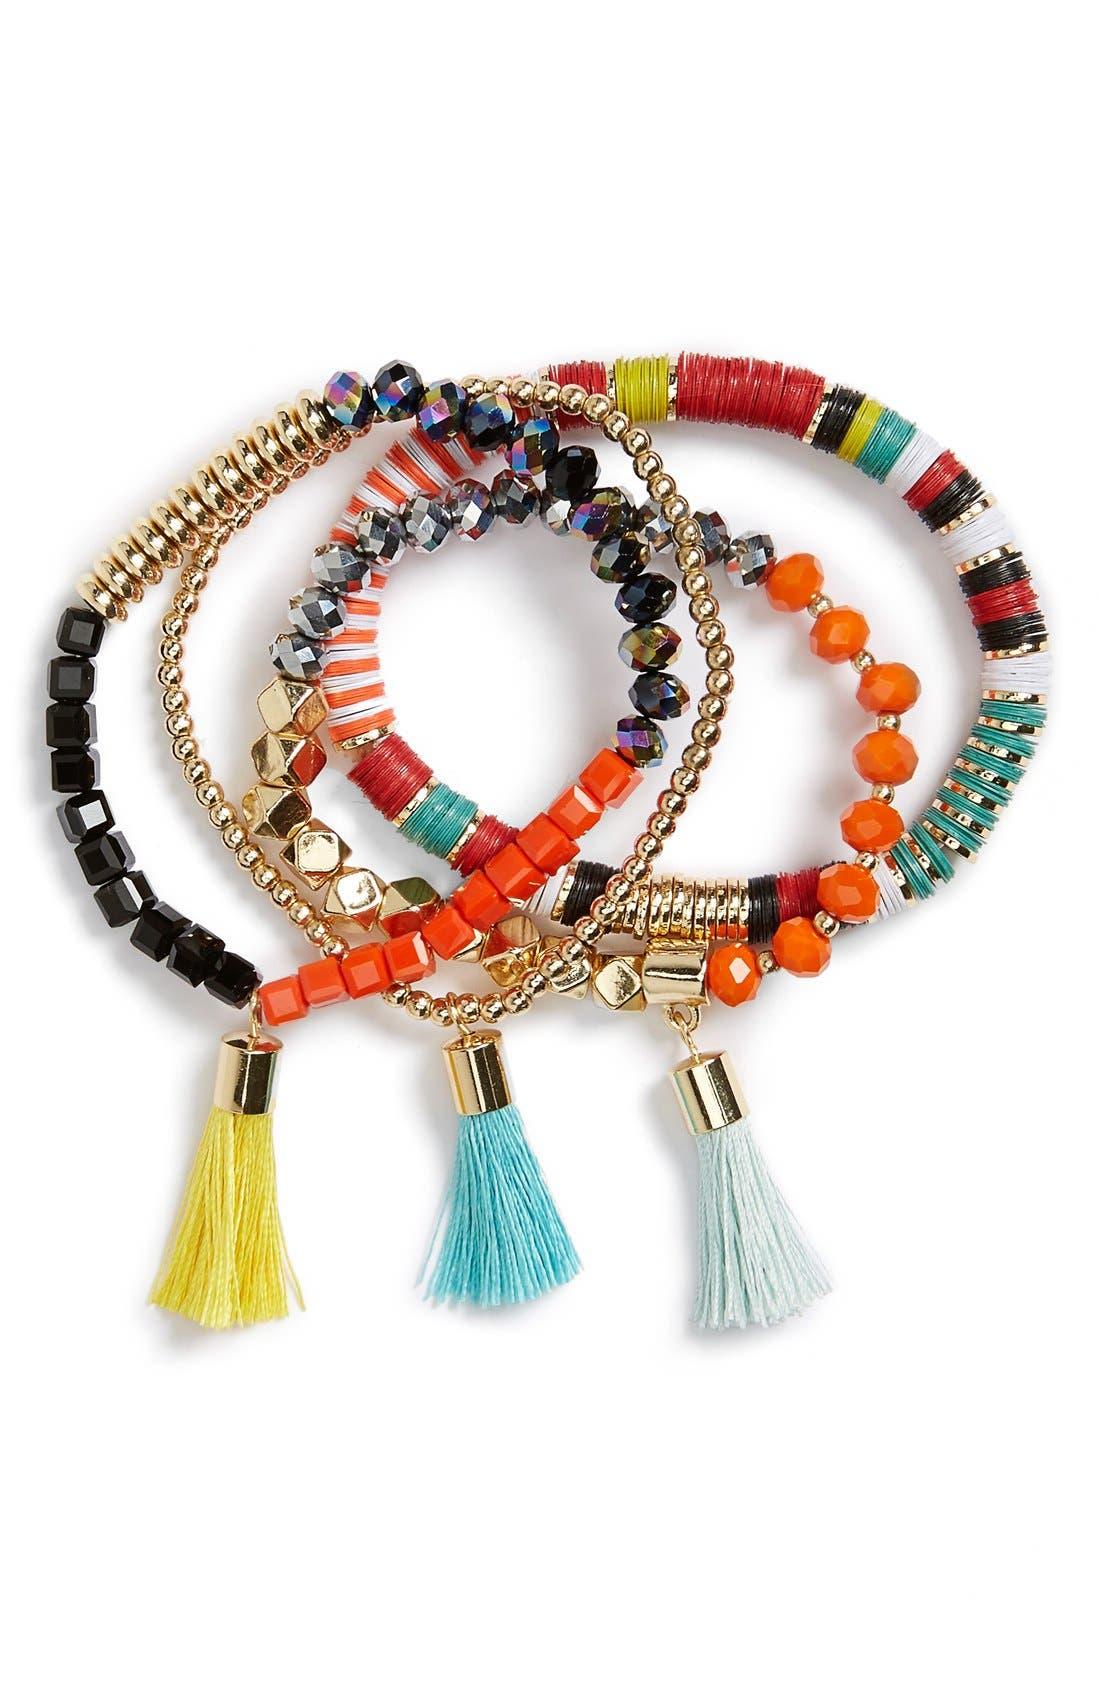 Main Image - BaubleBar 'Maldives' Beaded Stretch Bracelets (Set of 4)